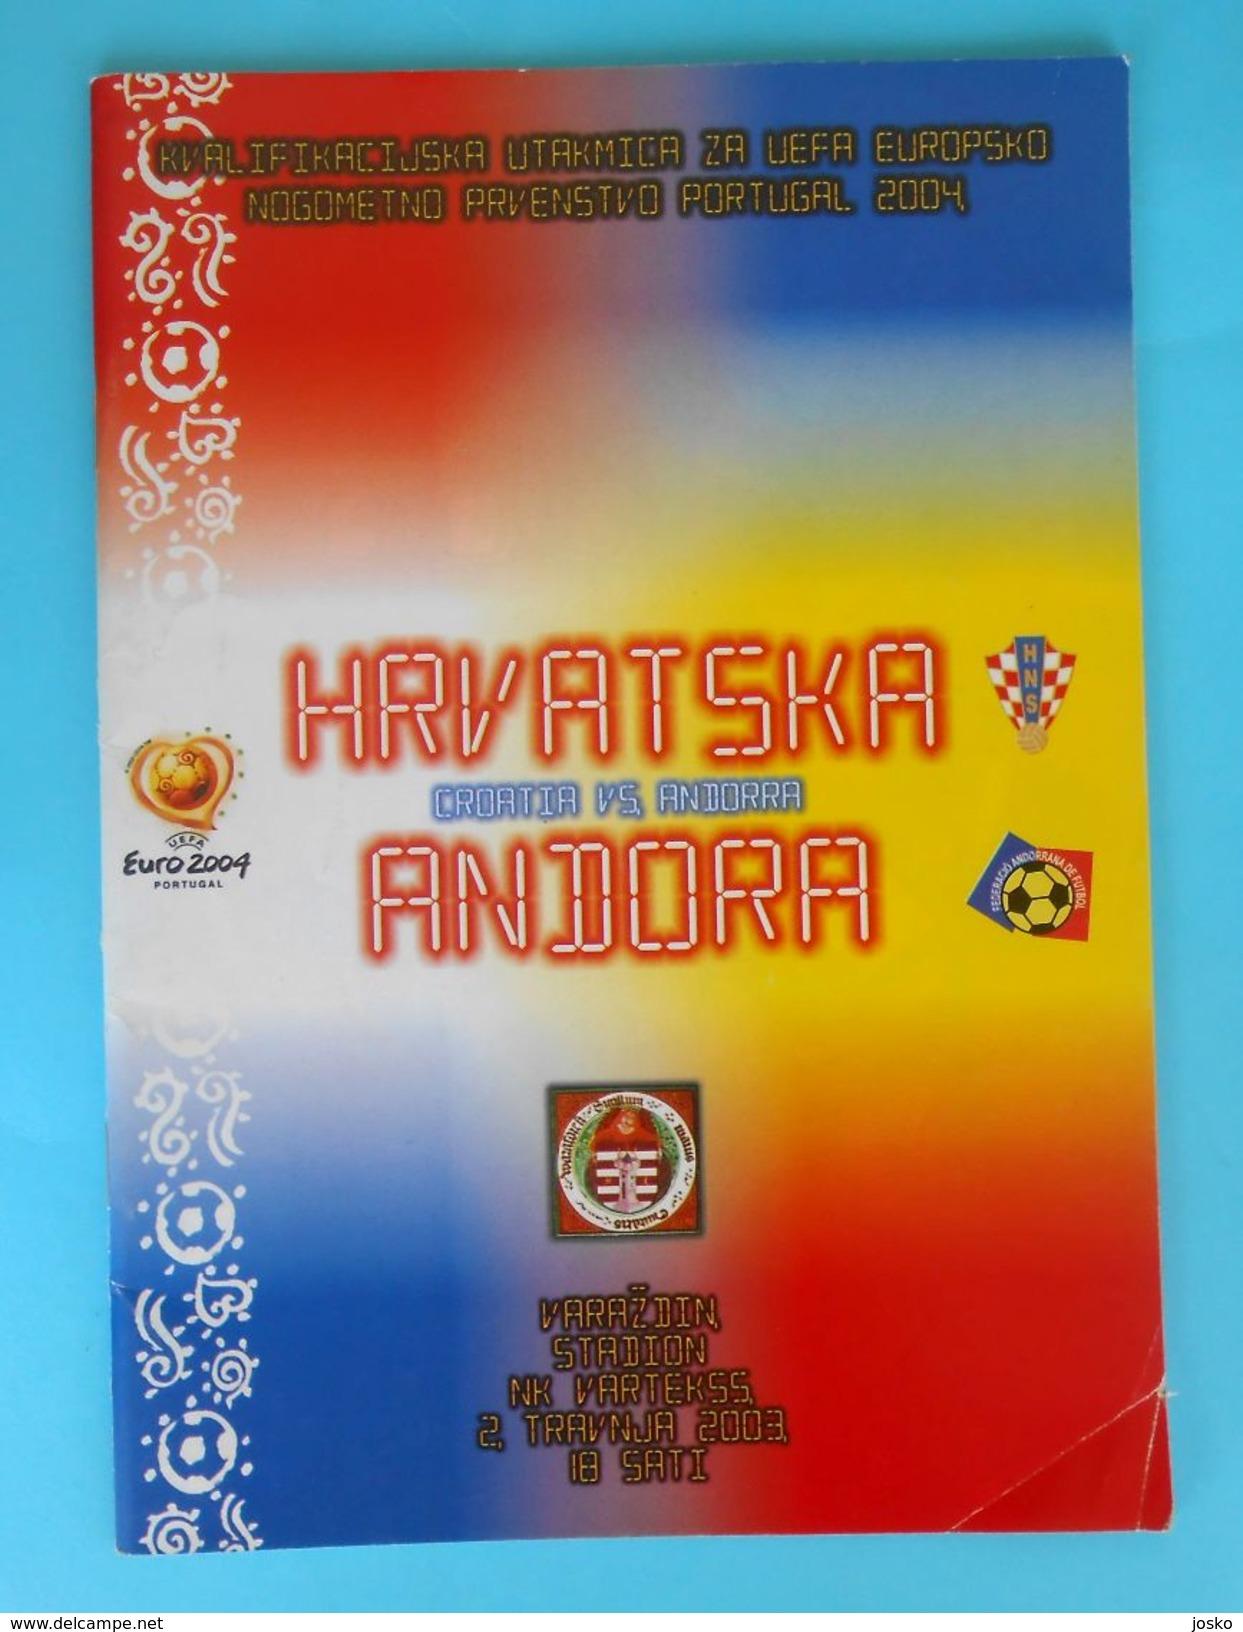 CROATIA : ANDORRA - 2003. Football Match Programme Soccer Fussball Programm Programma Programa Kroatien Croatie Croazia - Books